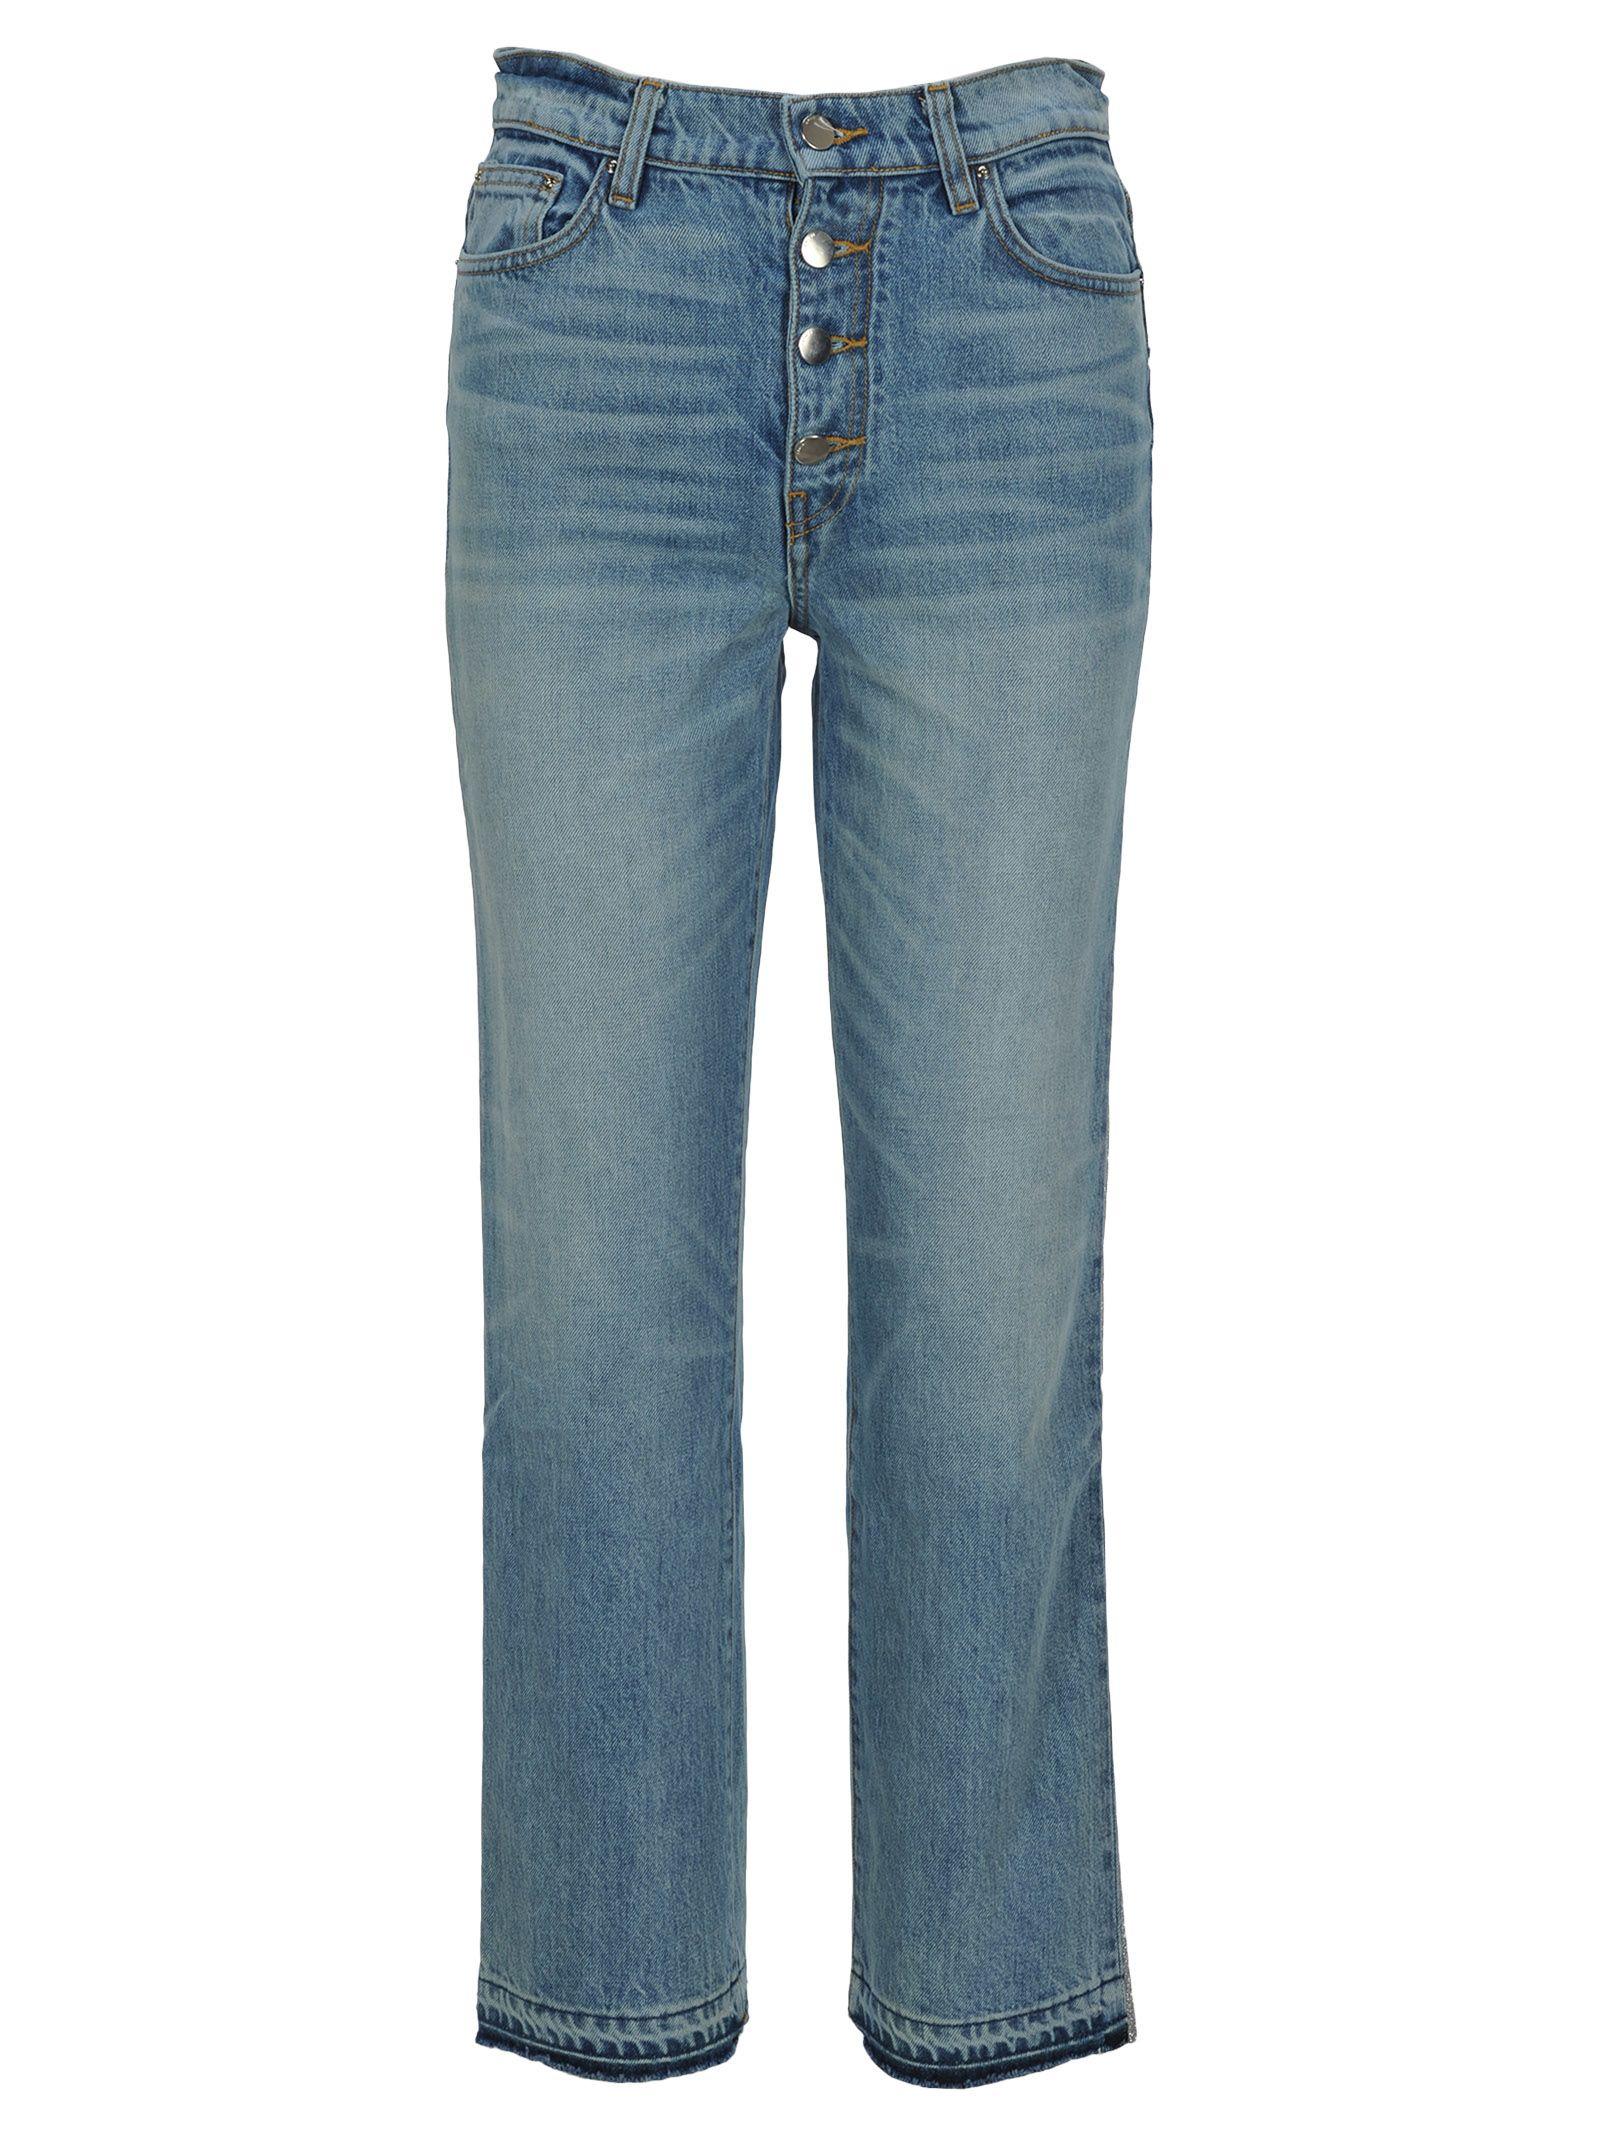 Amiri Glitter Track Straight Jeans, Vintage Indigo/Silver